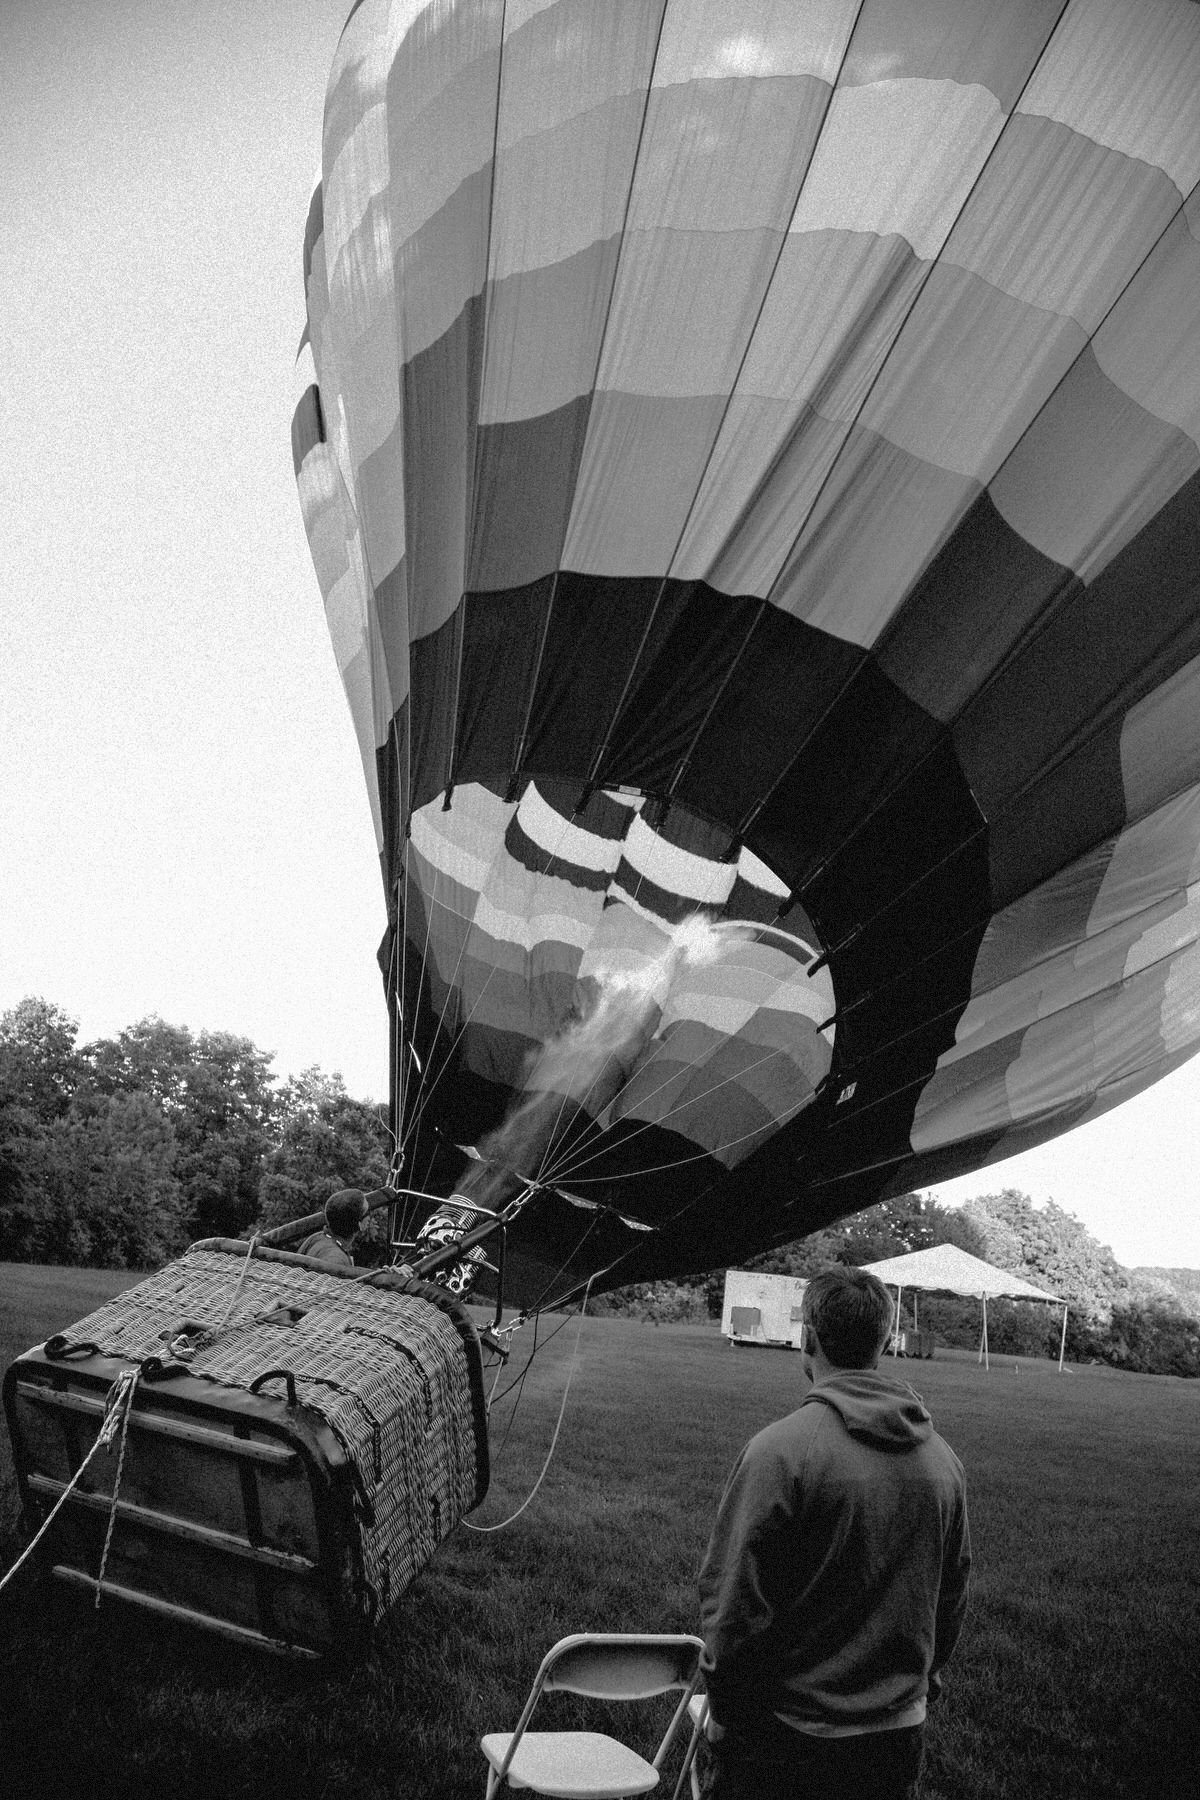 Hot-Air-Balloon-Ride-Galena-Illinois-fine-art-photography-by-Studio-L-photographer-Laura-Schneider-_6129